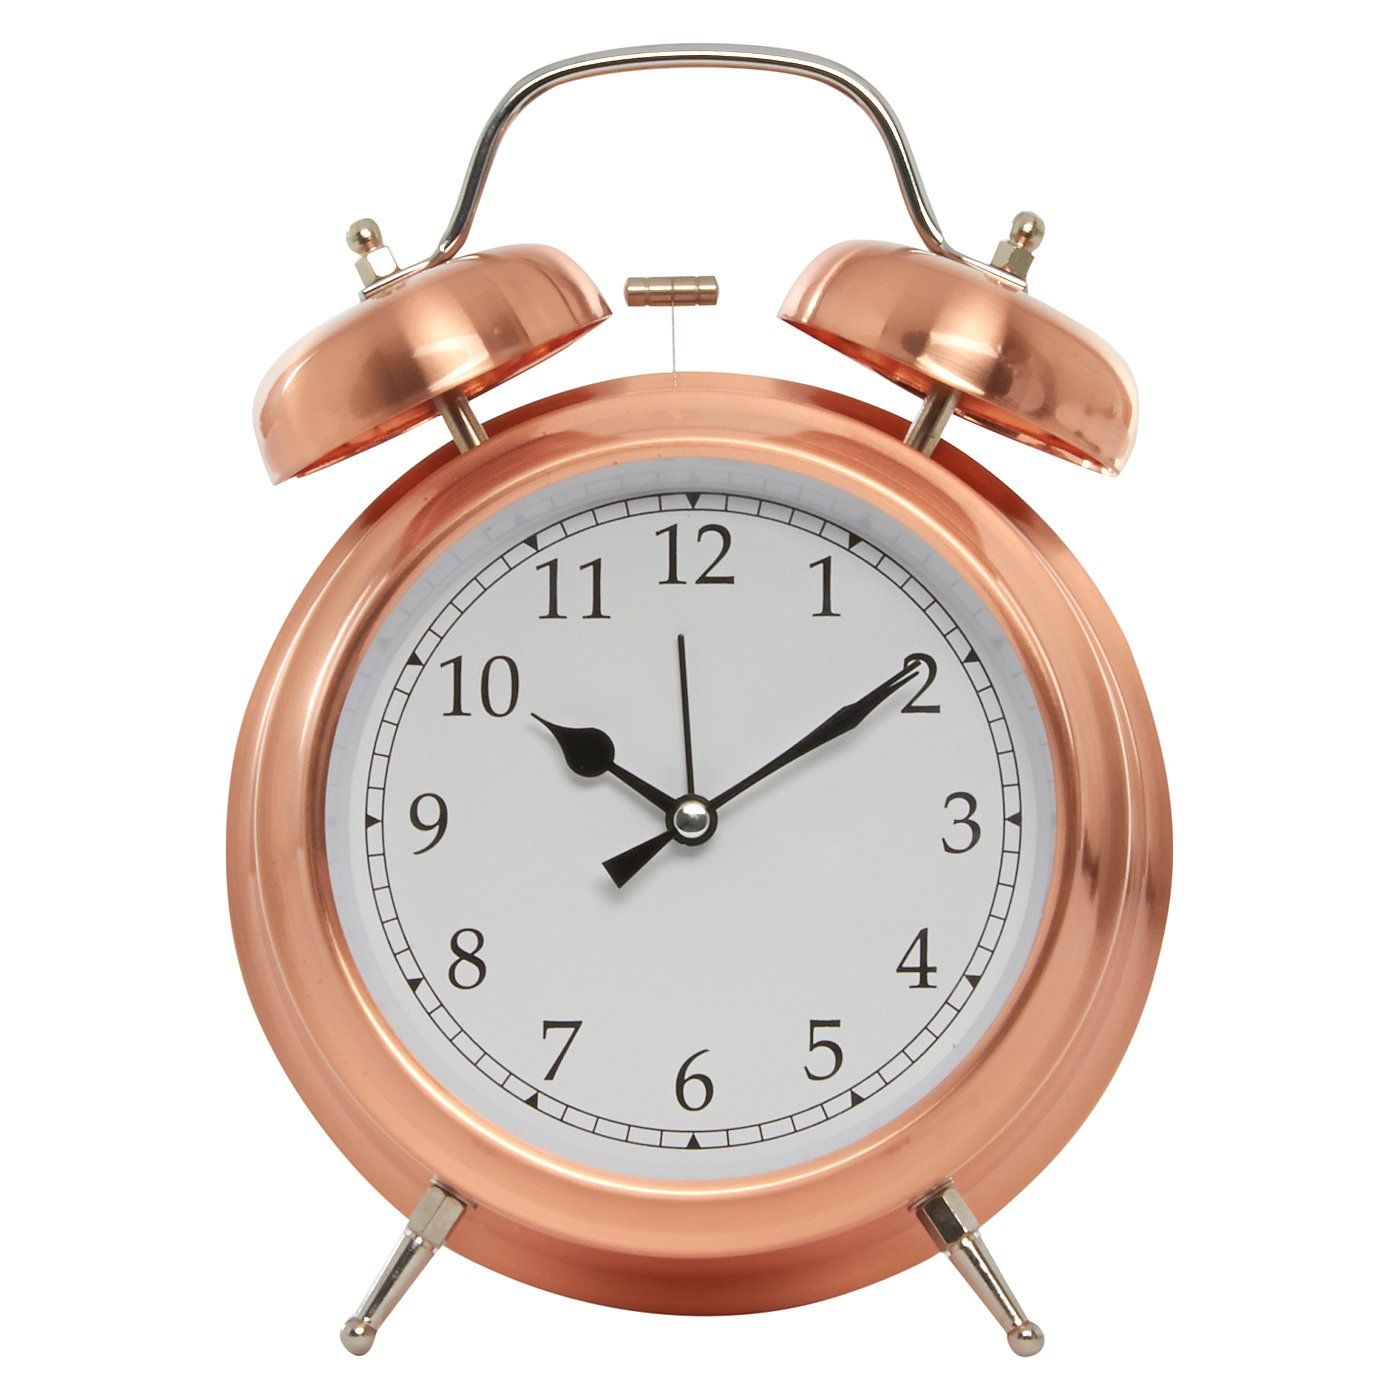 George Home Copper Finish Double Bell Alarm Clock Home Accessories Asda Direct Copper Home Accessories George Home Clock